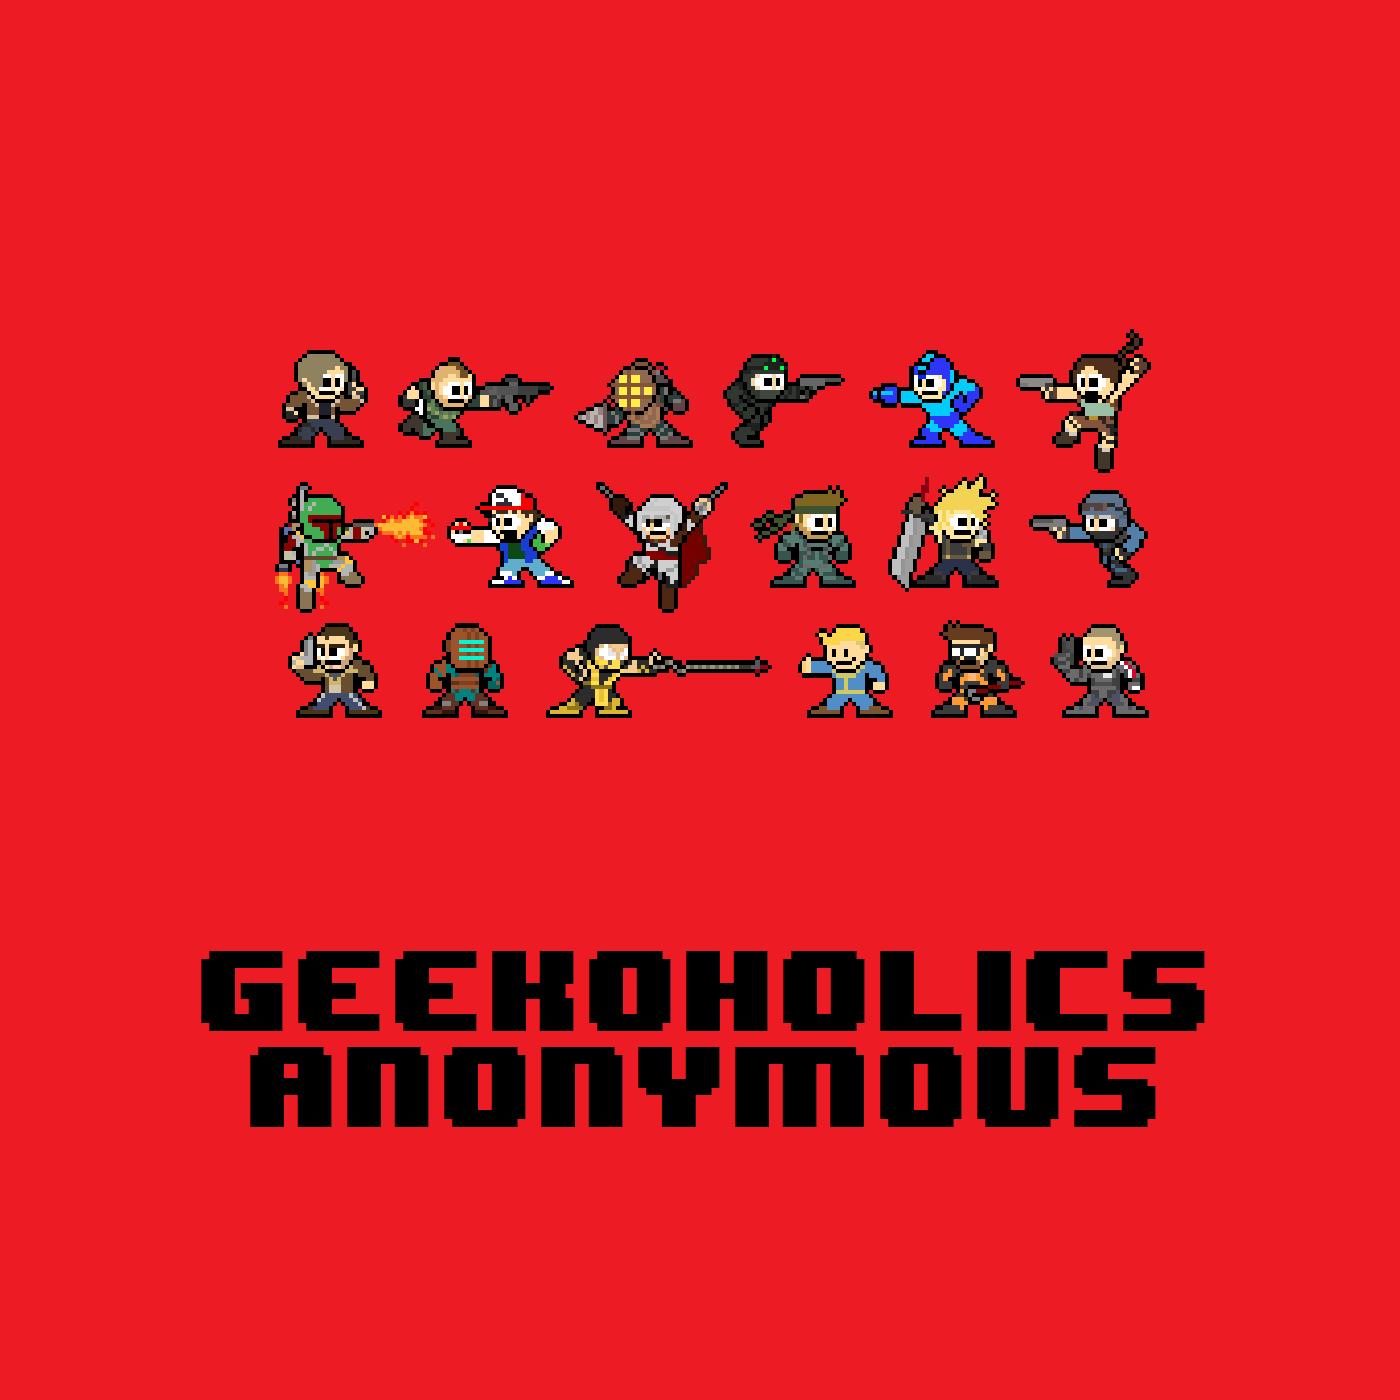 Geekoholics Anonymous logo